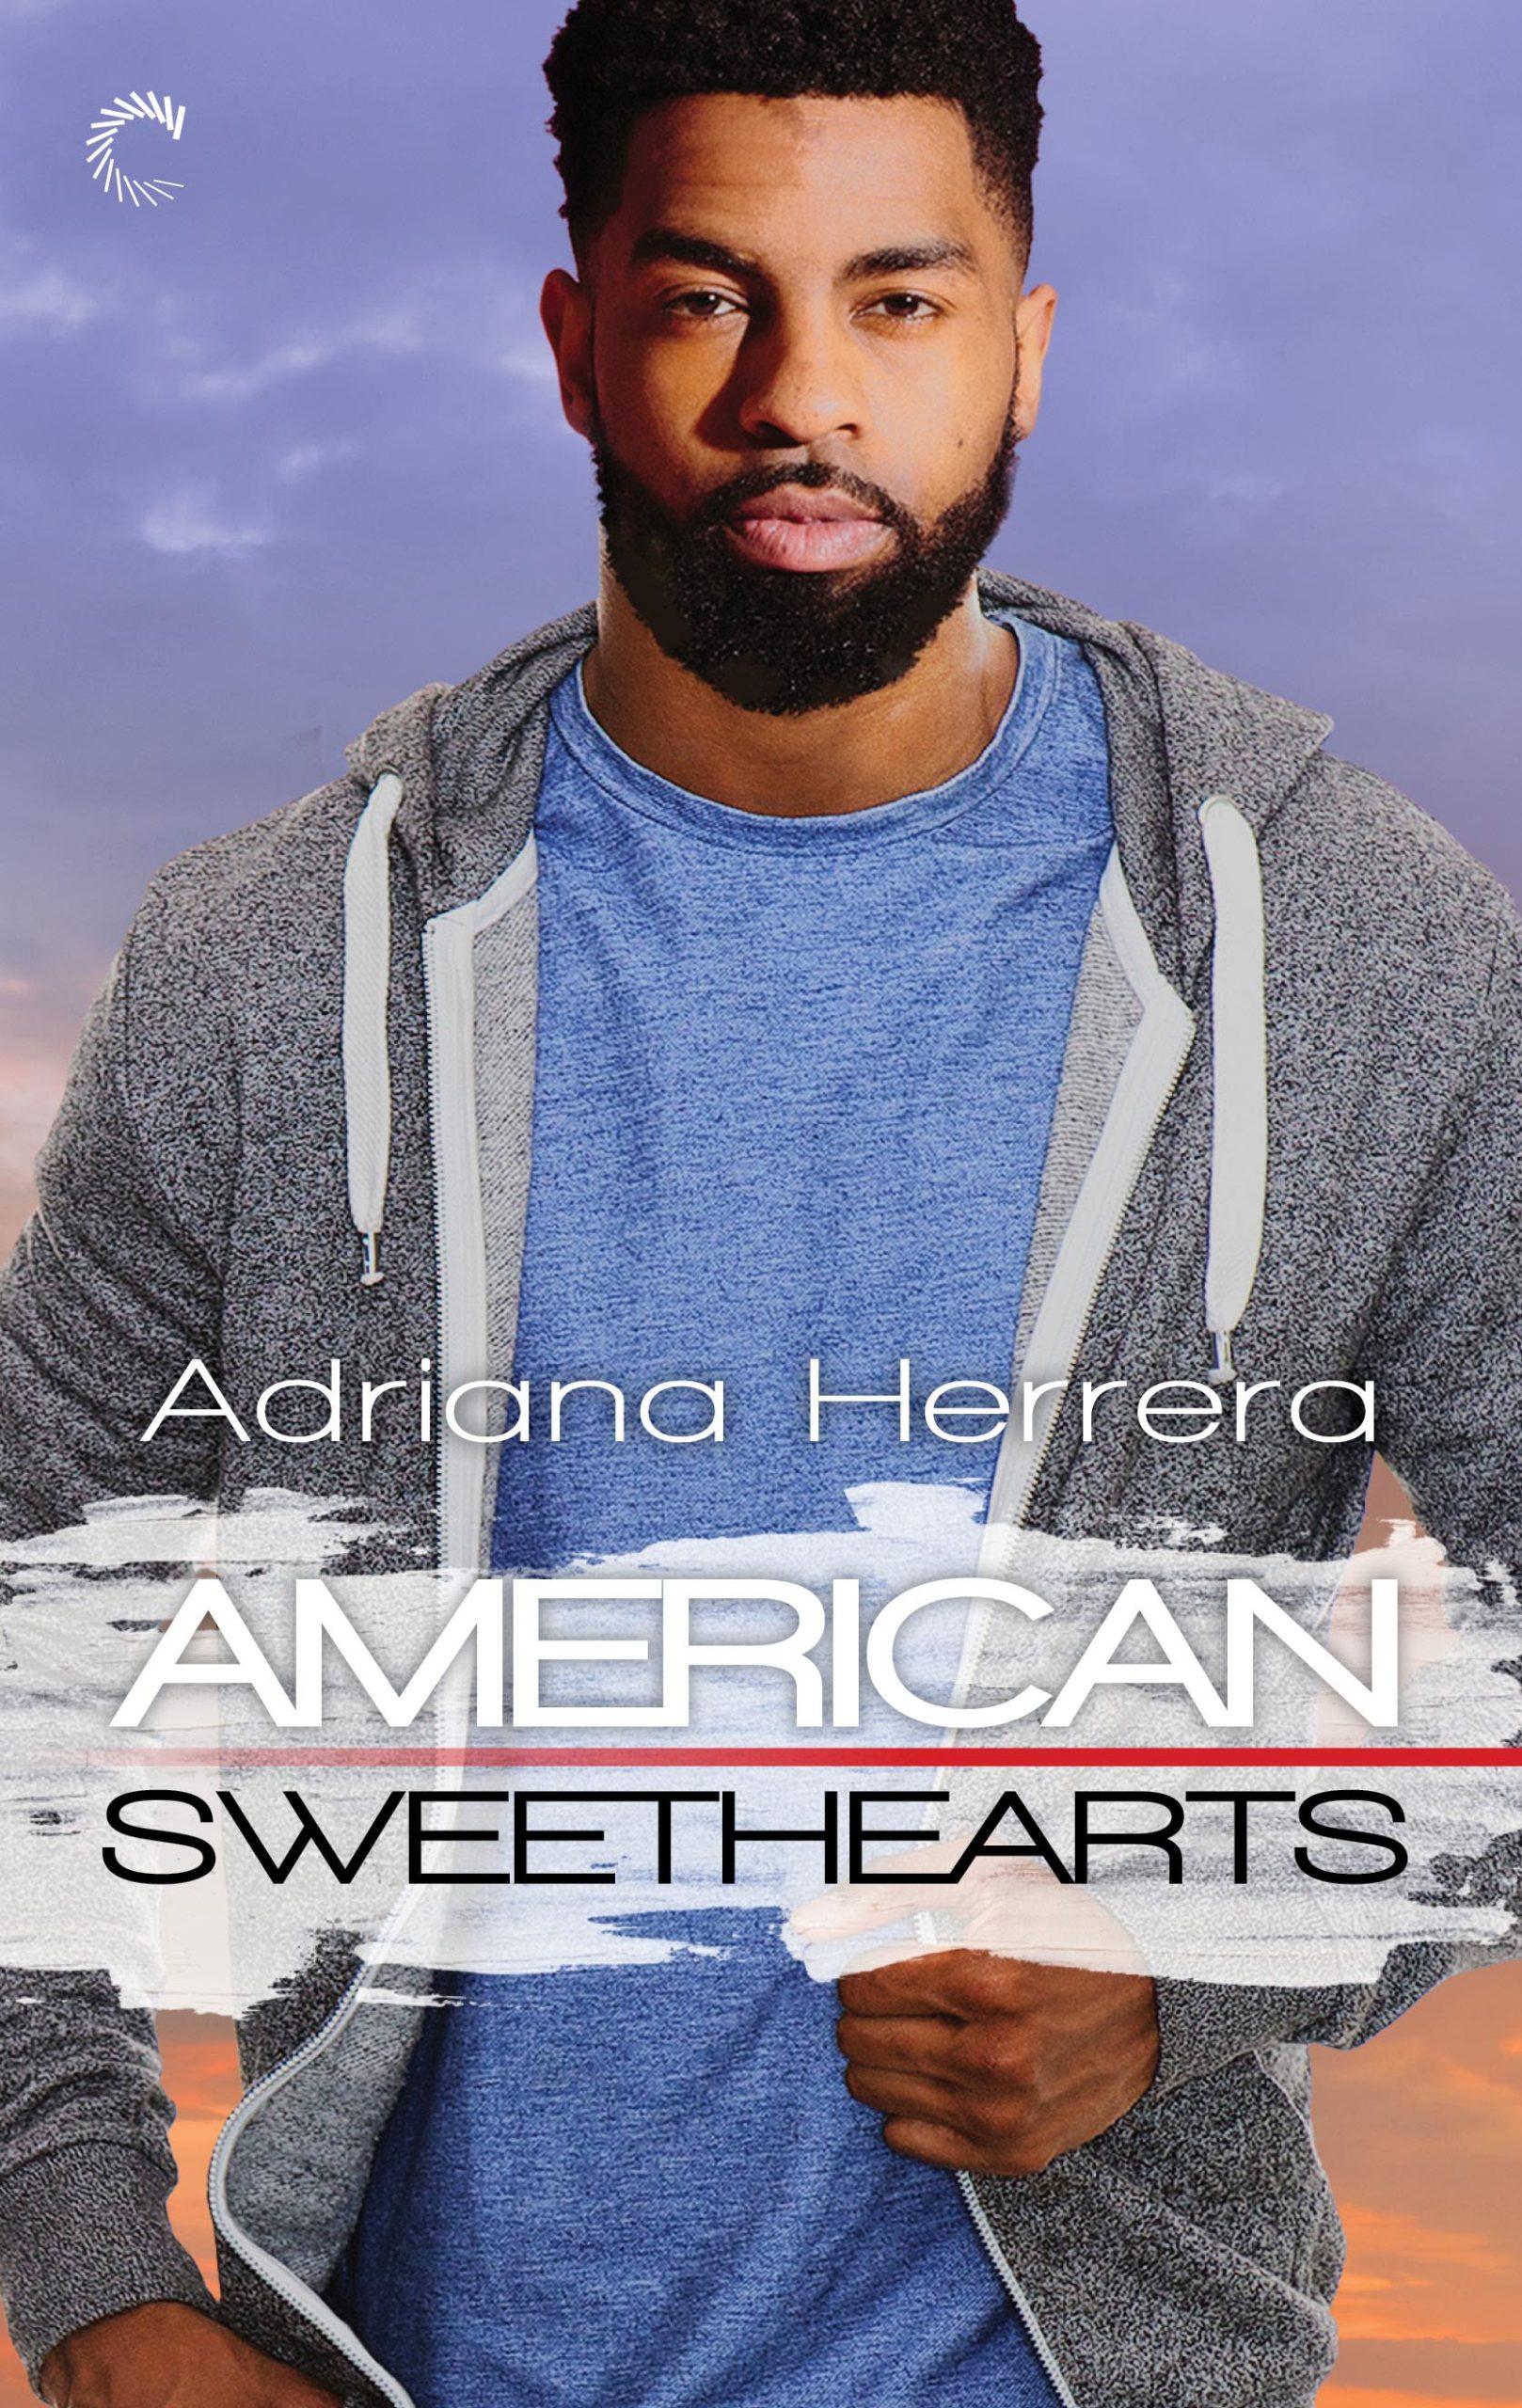 American Sweethearts by Adriana Herrera (1)